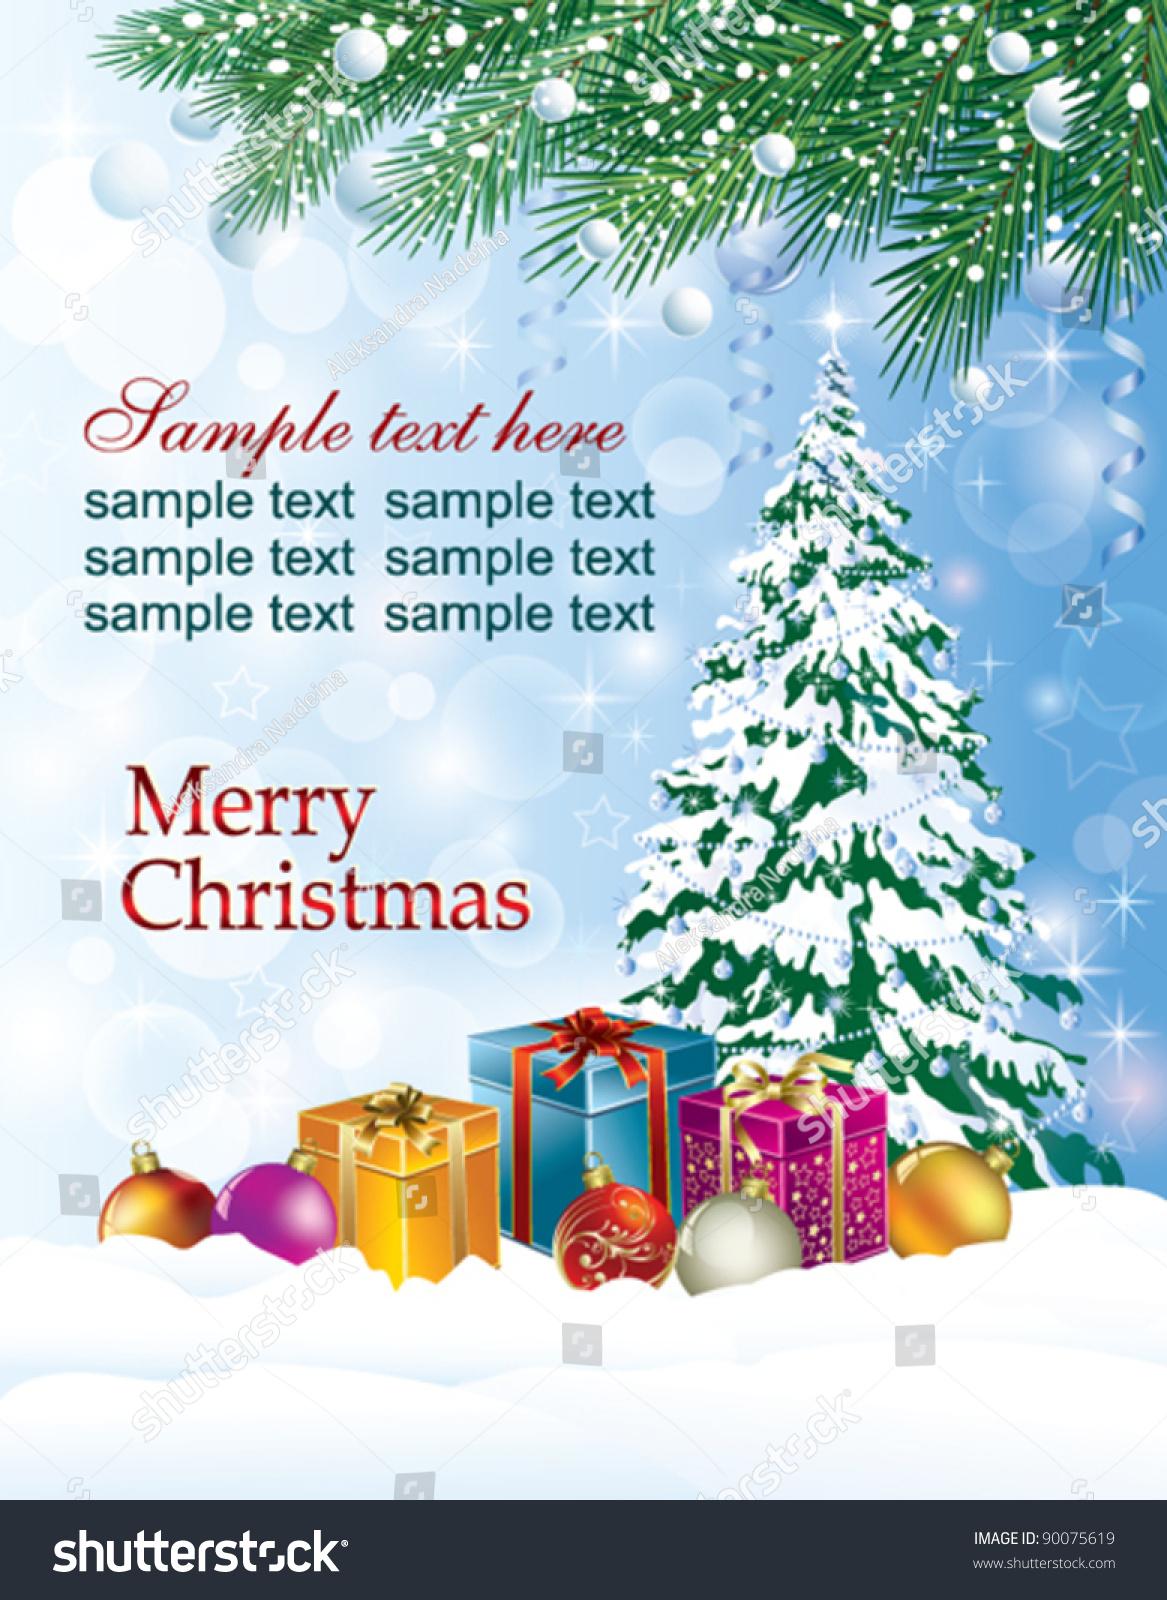 Christmas greeting card christmas tree present stock vector christmas greeting card with christmas tree and present box kristyandbryce Choice Image